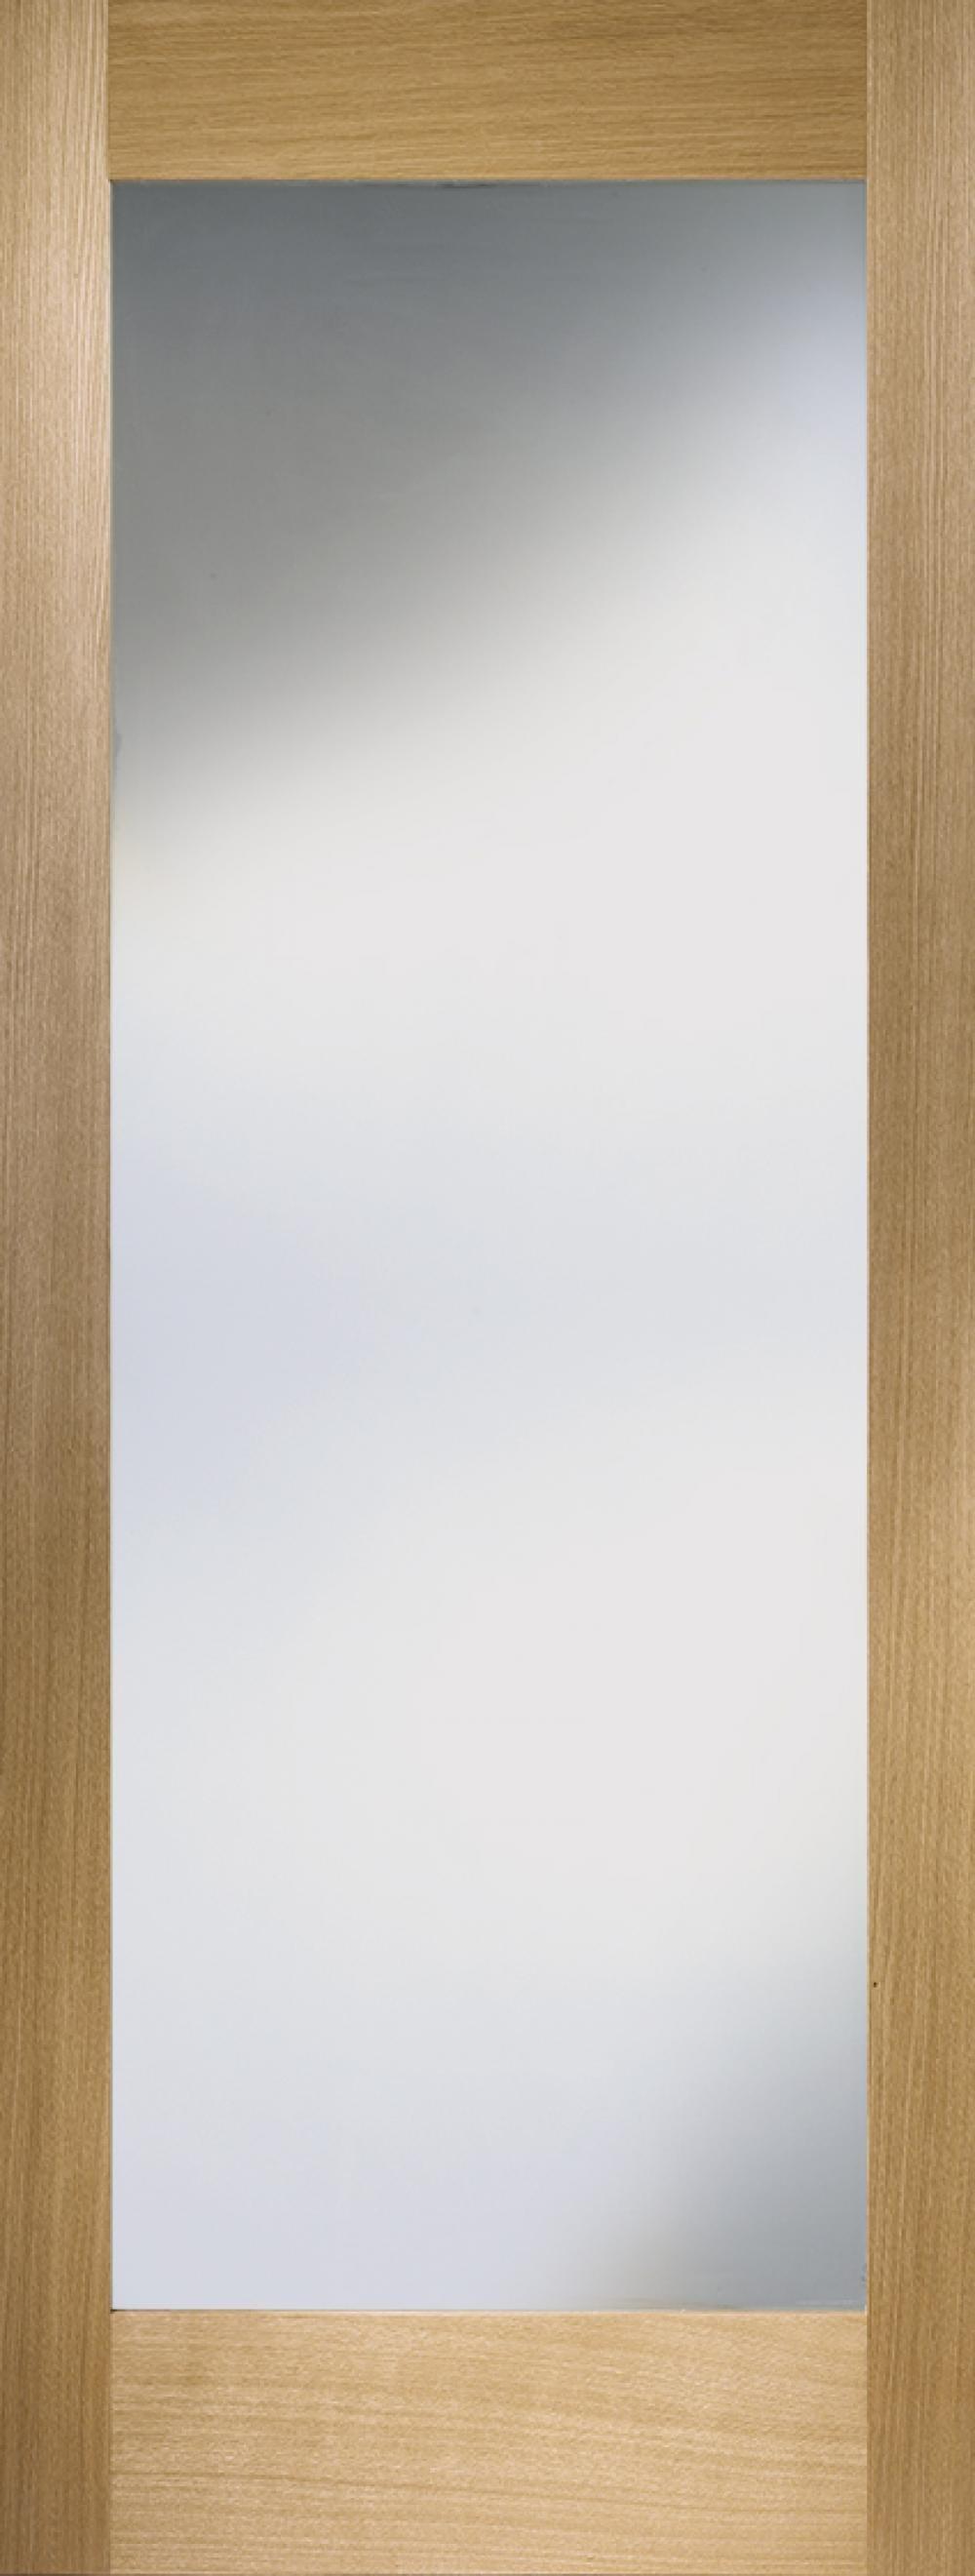 Oak Shaker 1 Light - Prefinished Frosted Image